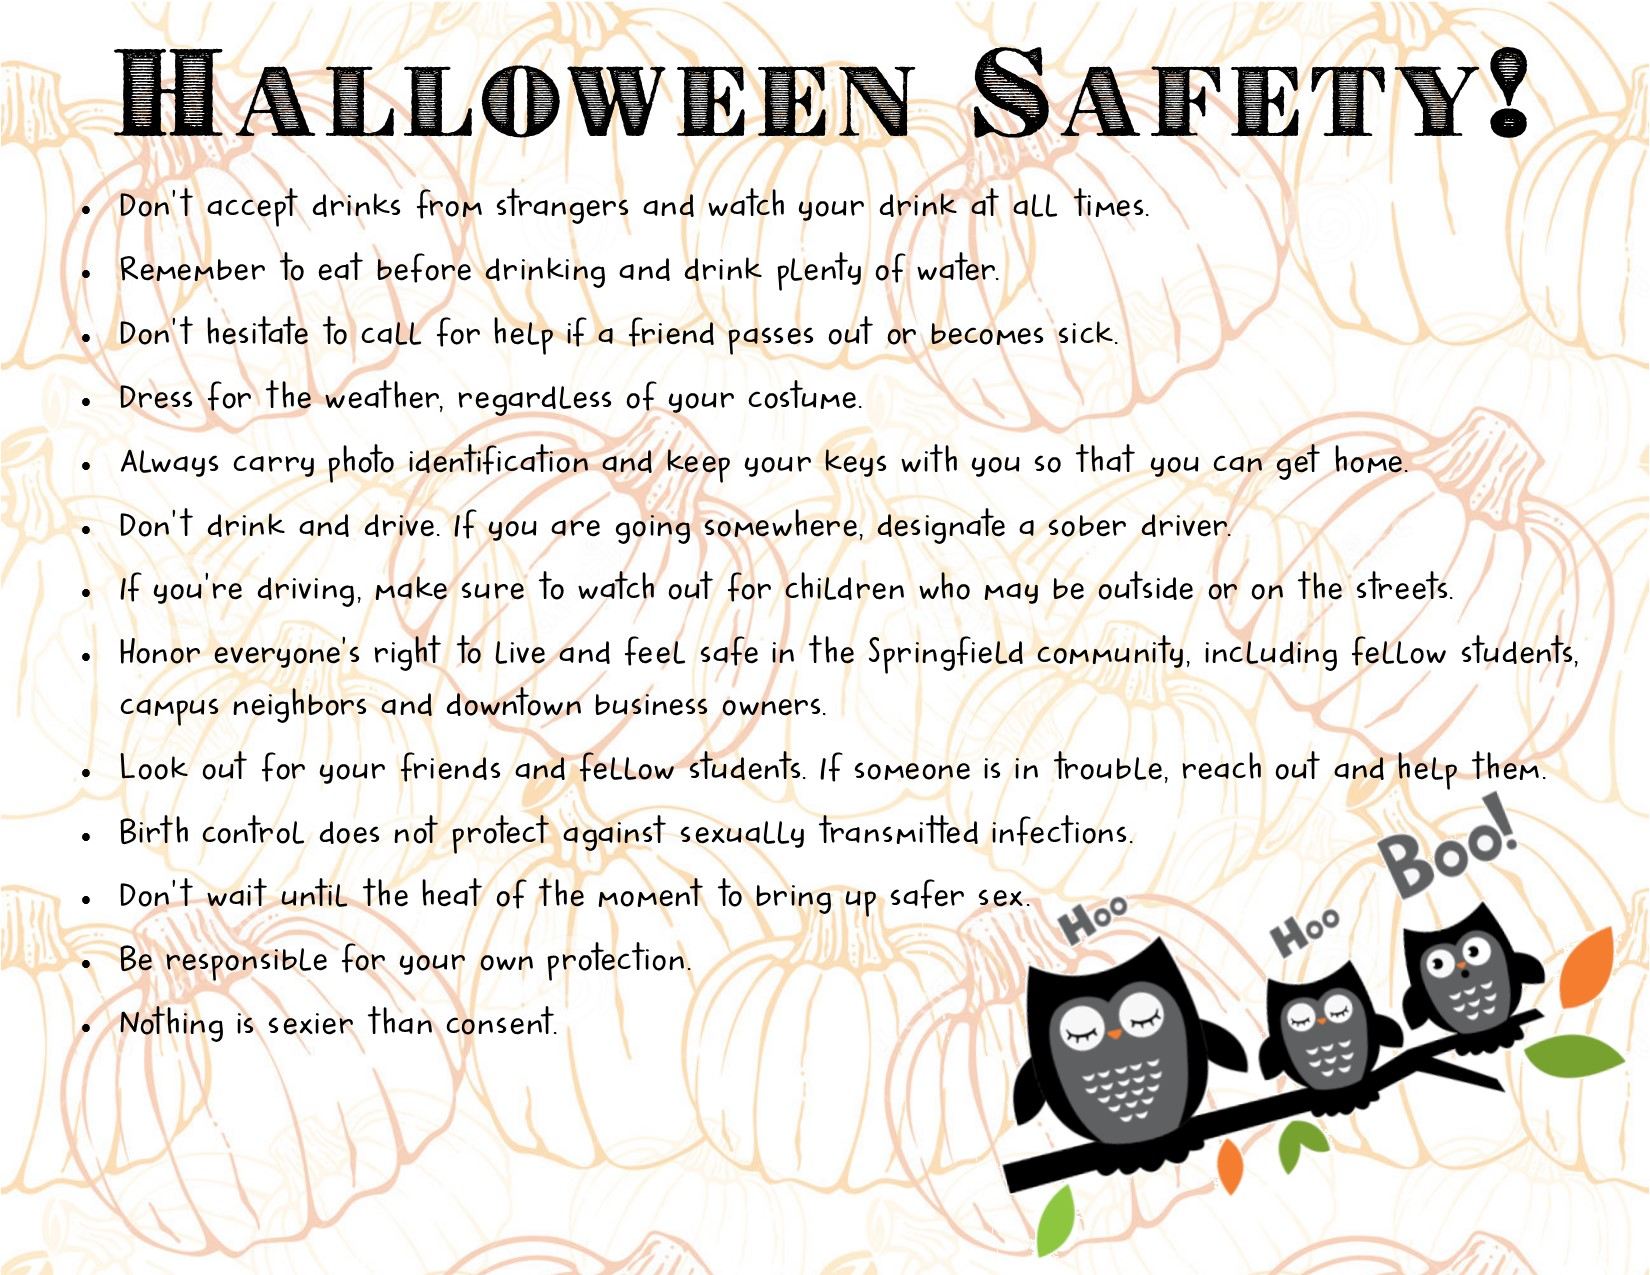 Halloween Safety!